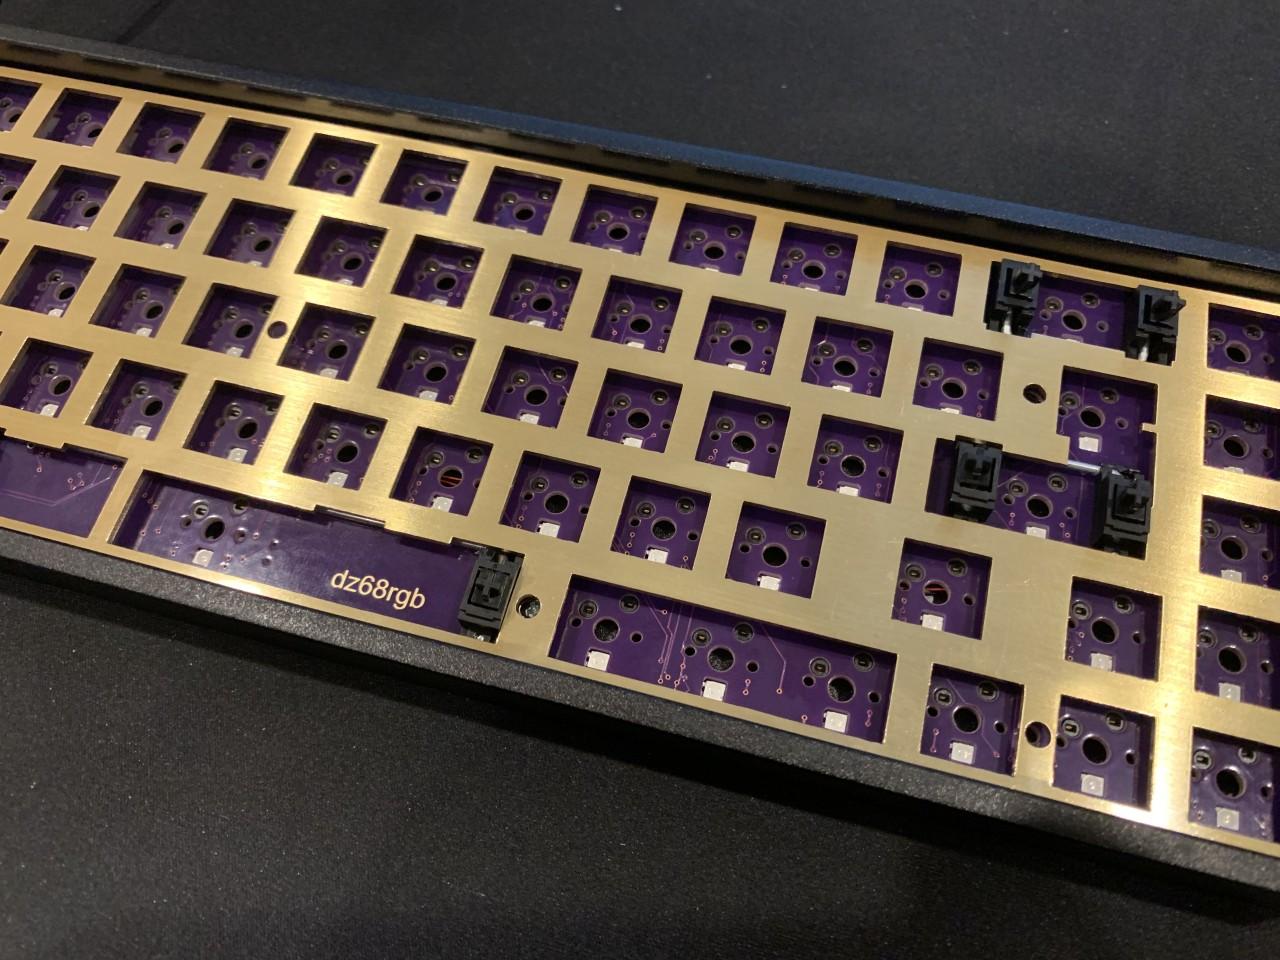 /img/hardware/custom-keyboard-dz65rgb/IMG_4851.jpg